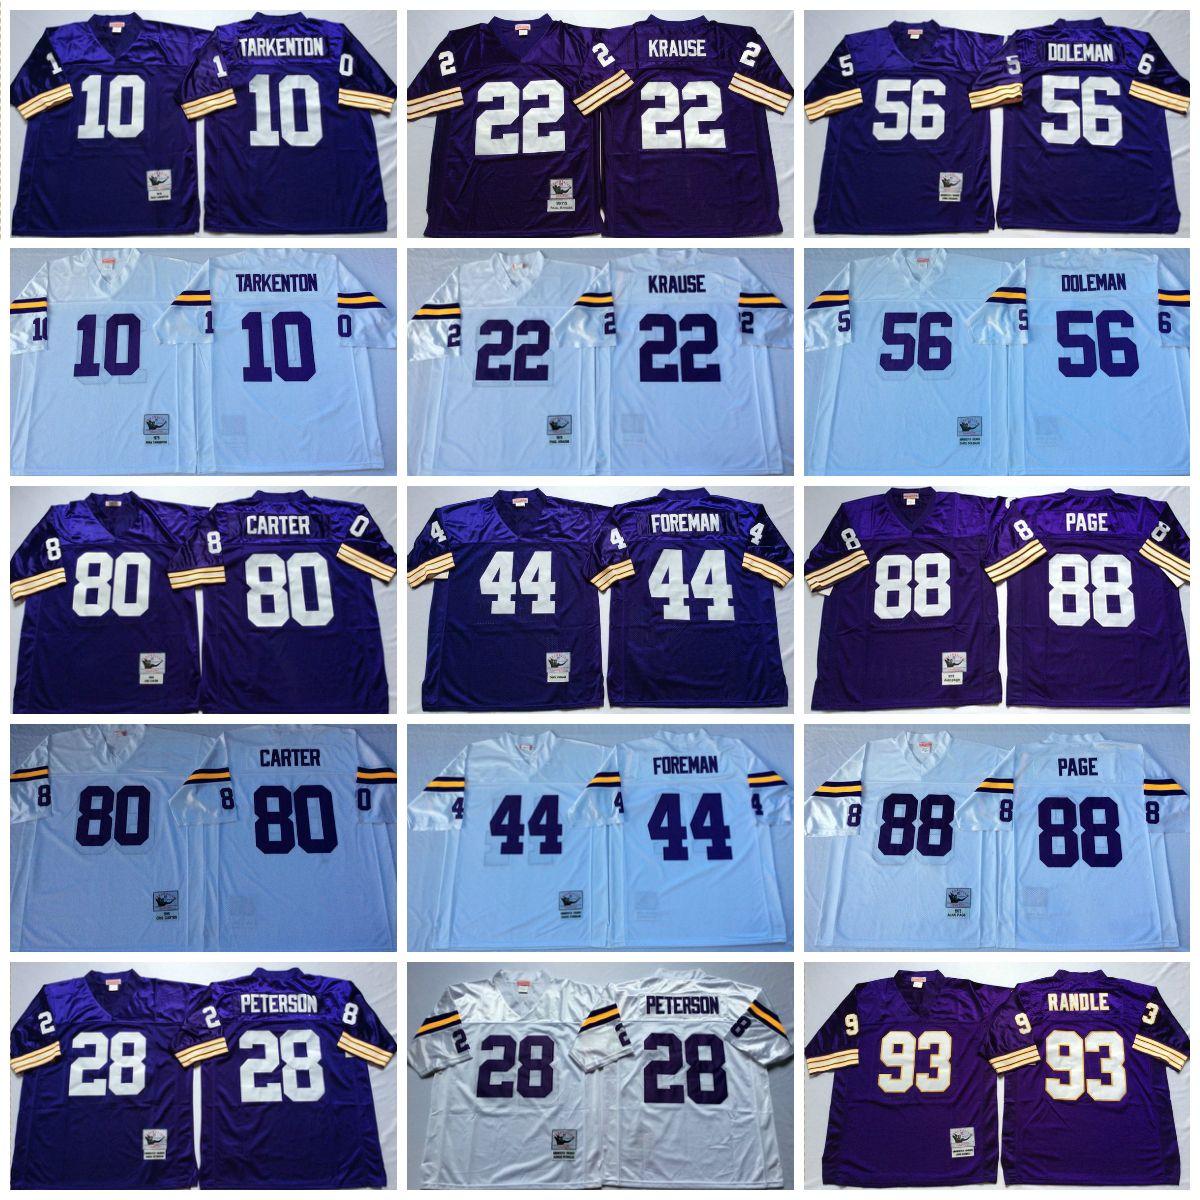 buy online 0e392 86d92 56 chris doleman jersey manufacturing